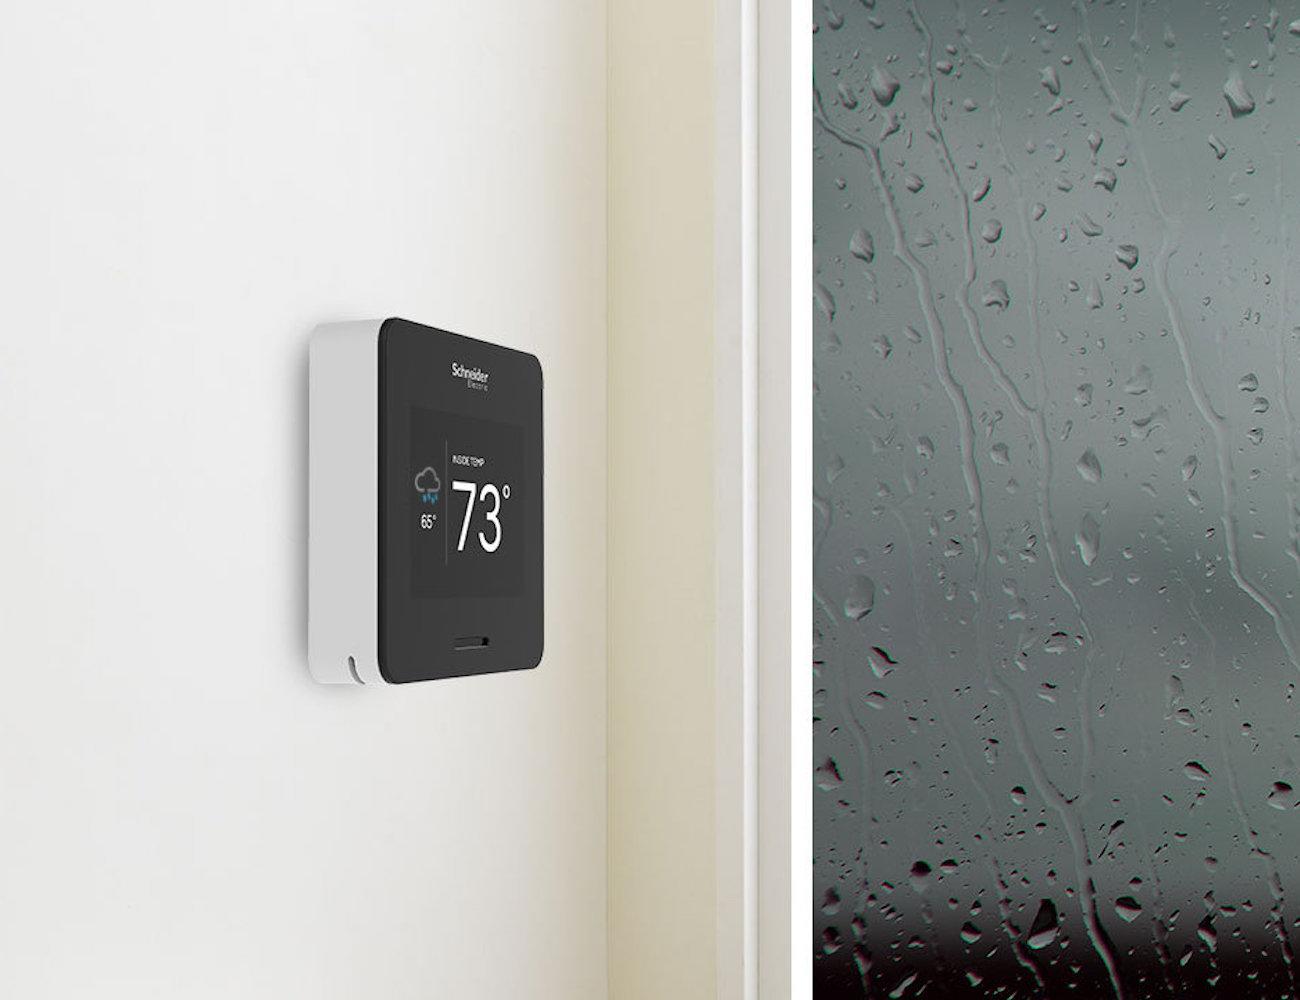 Wiser Air Smart Thermostat by Schneider Electric